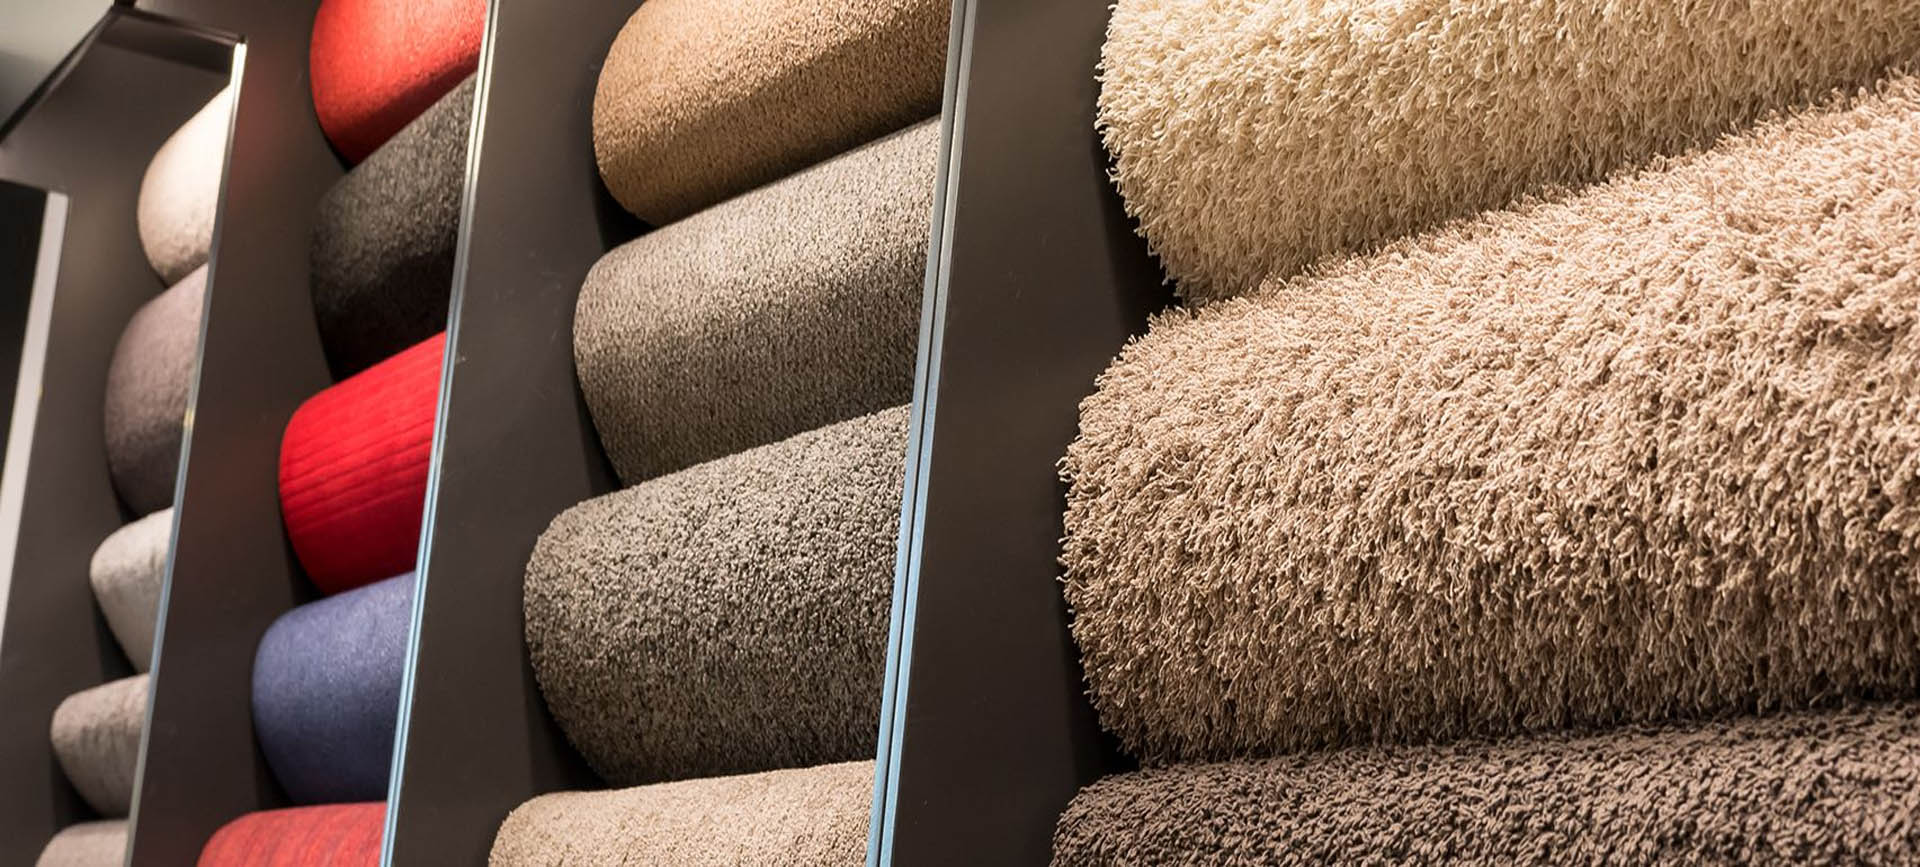 Focus on C John Rare Carpets in Mayfair